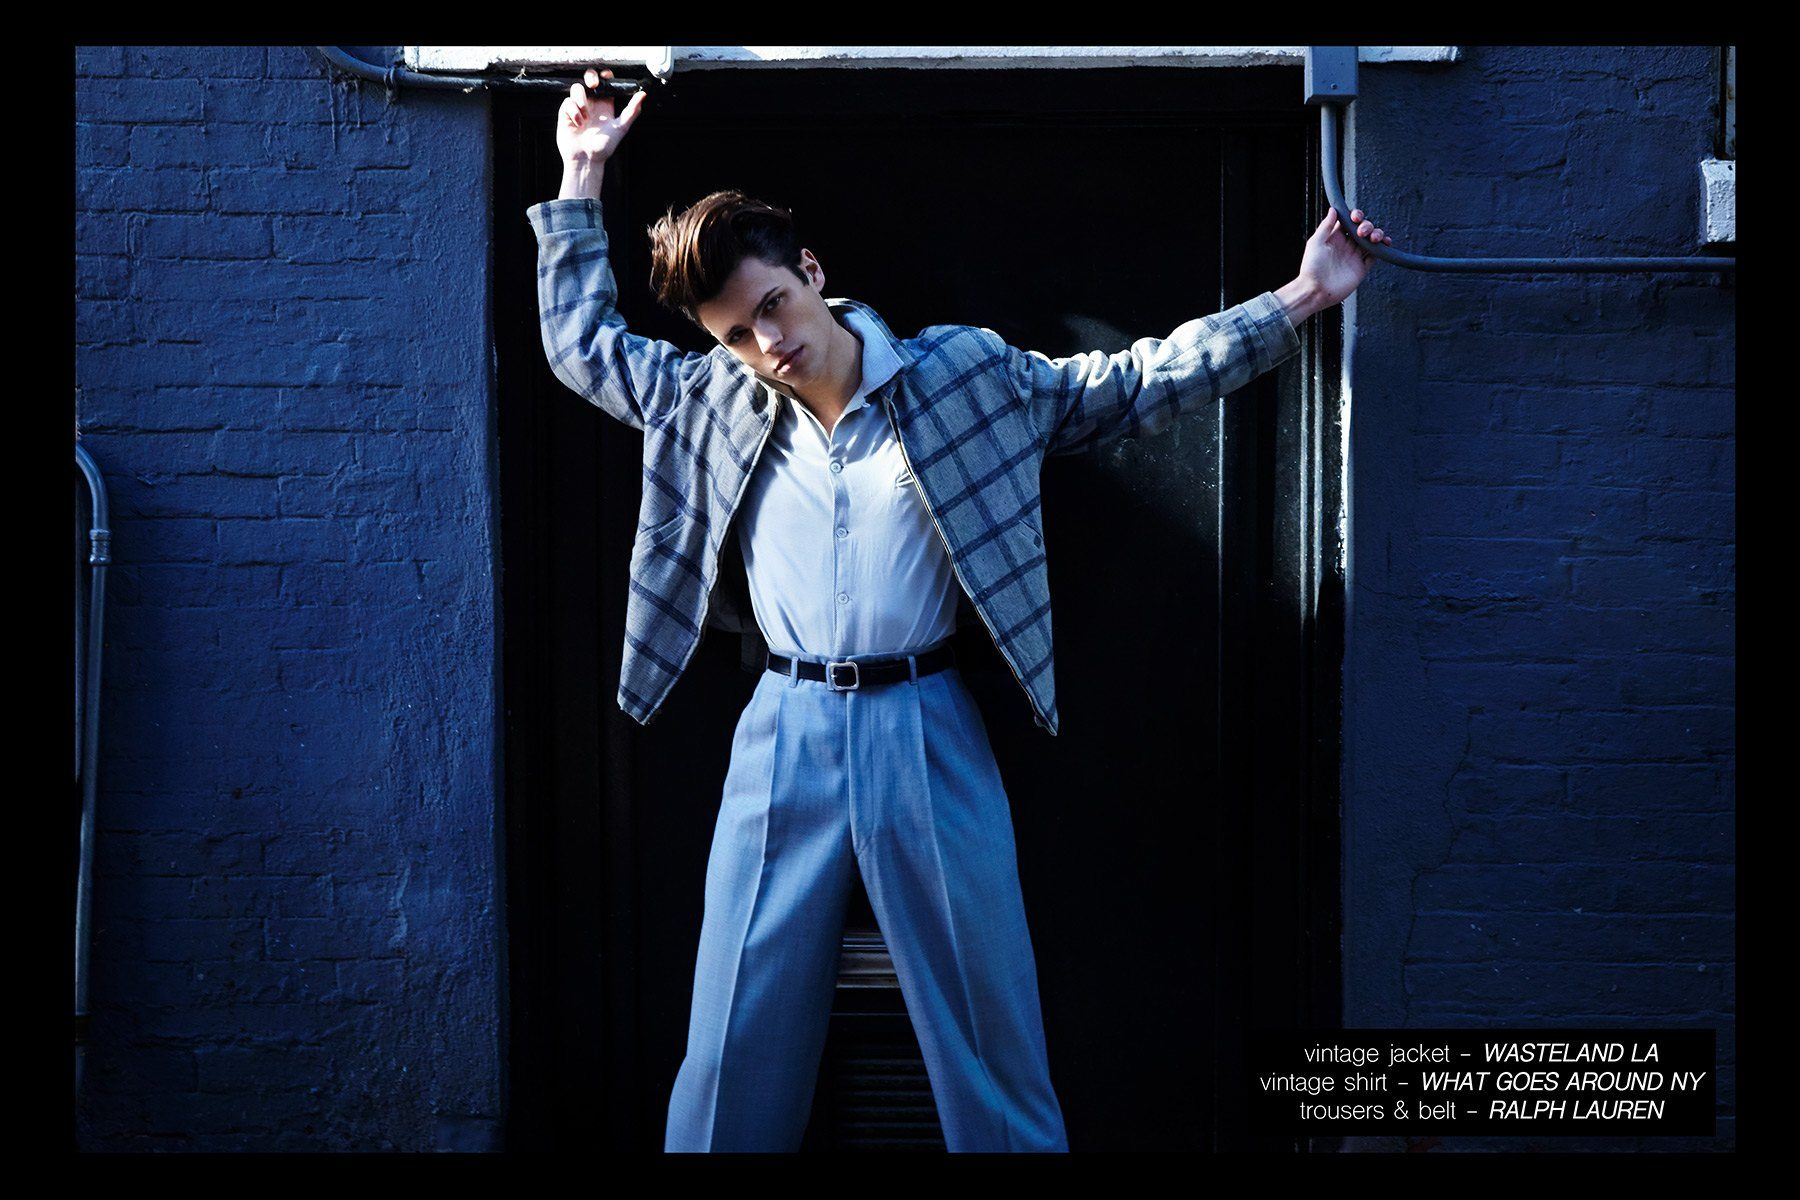 Male model Casey Jackson, from New York Model Management, wears 1950s vintage clothing. Photographed by Alexander Thompson for Ponyboy magazine NY.